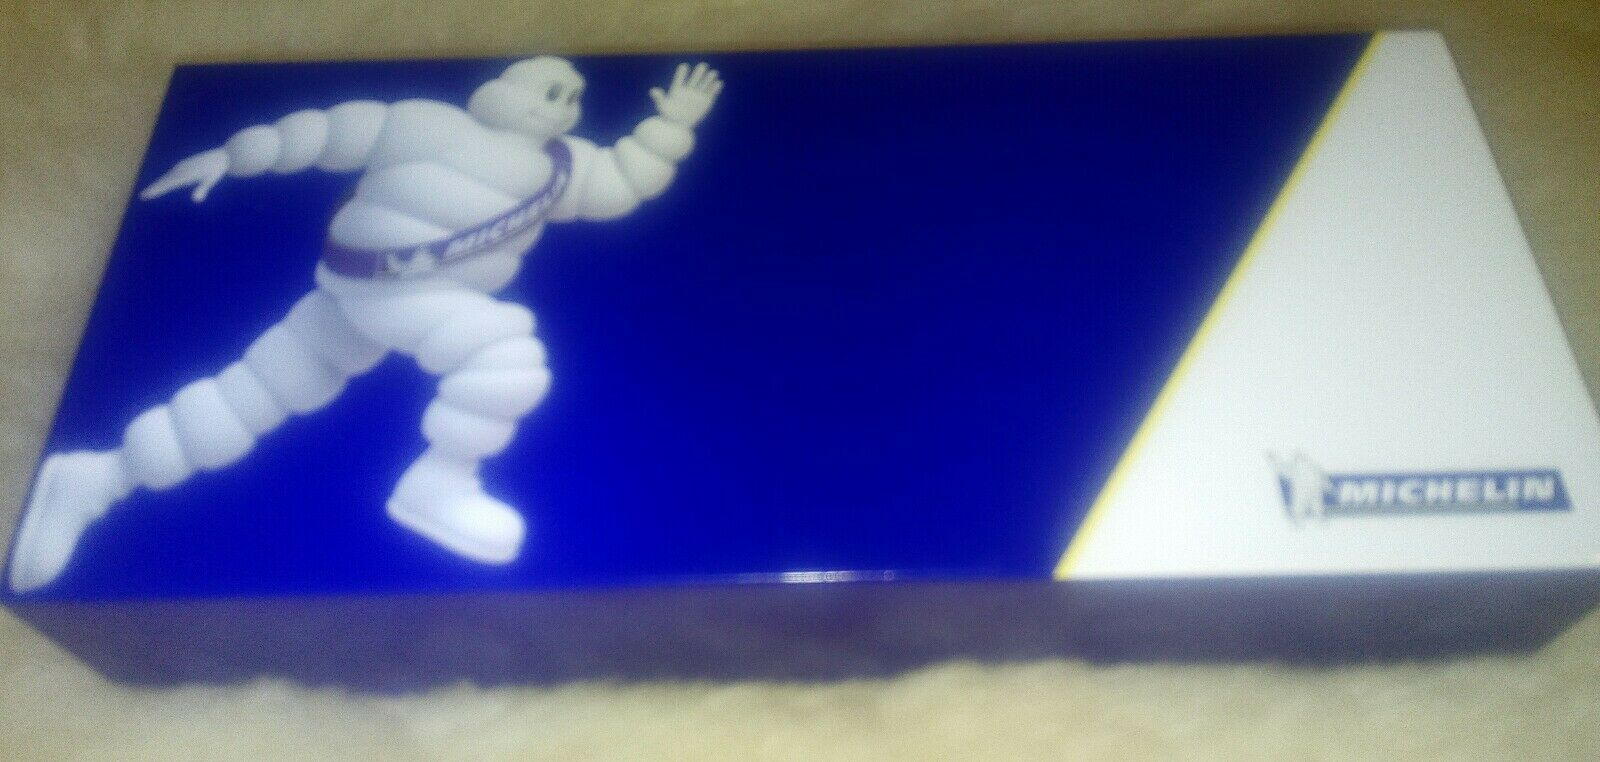 Michelin LED Teleskop Teleskop LED Metall Taschenlampe 07790c